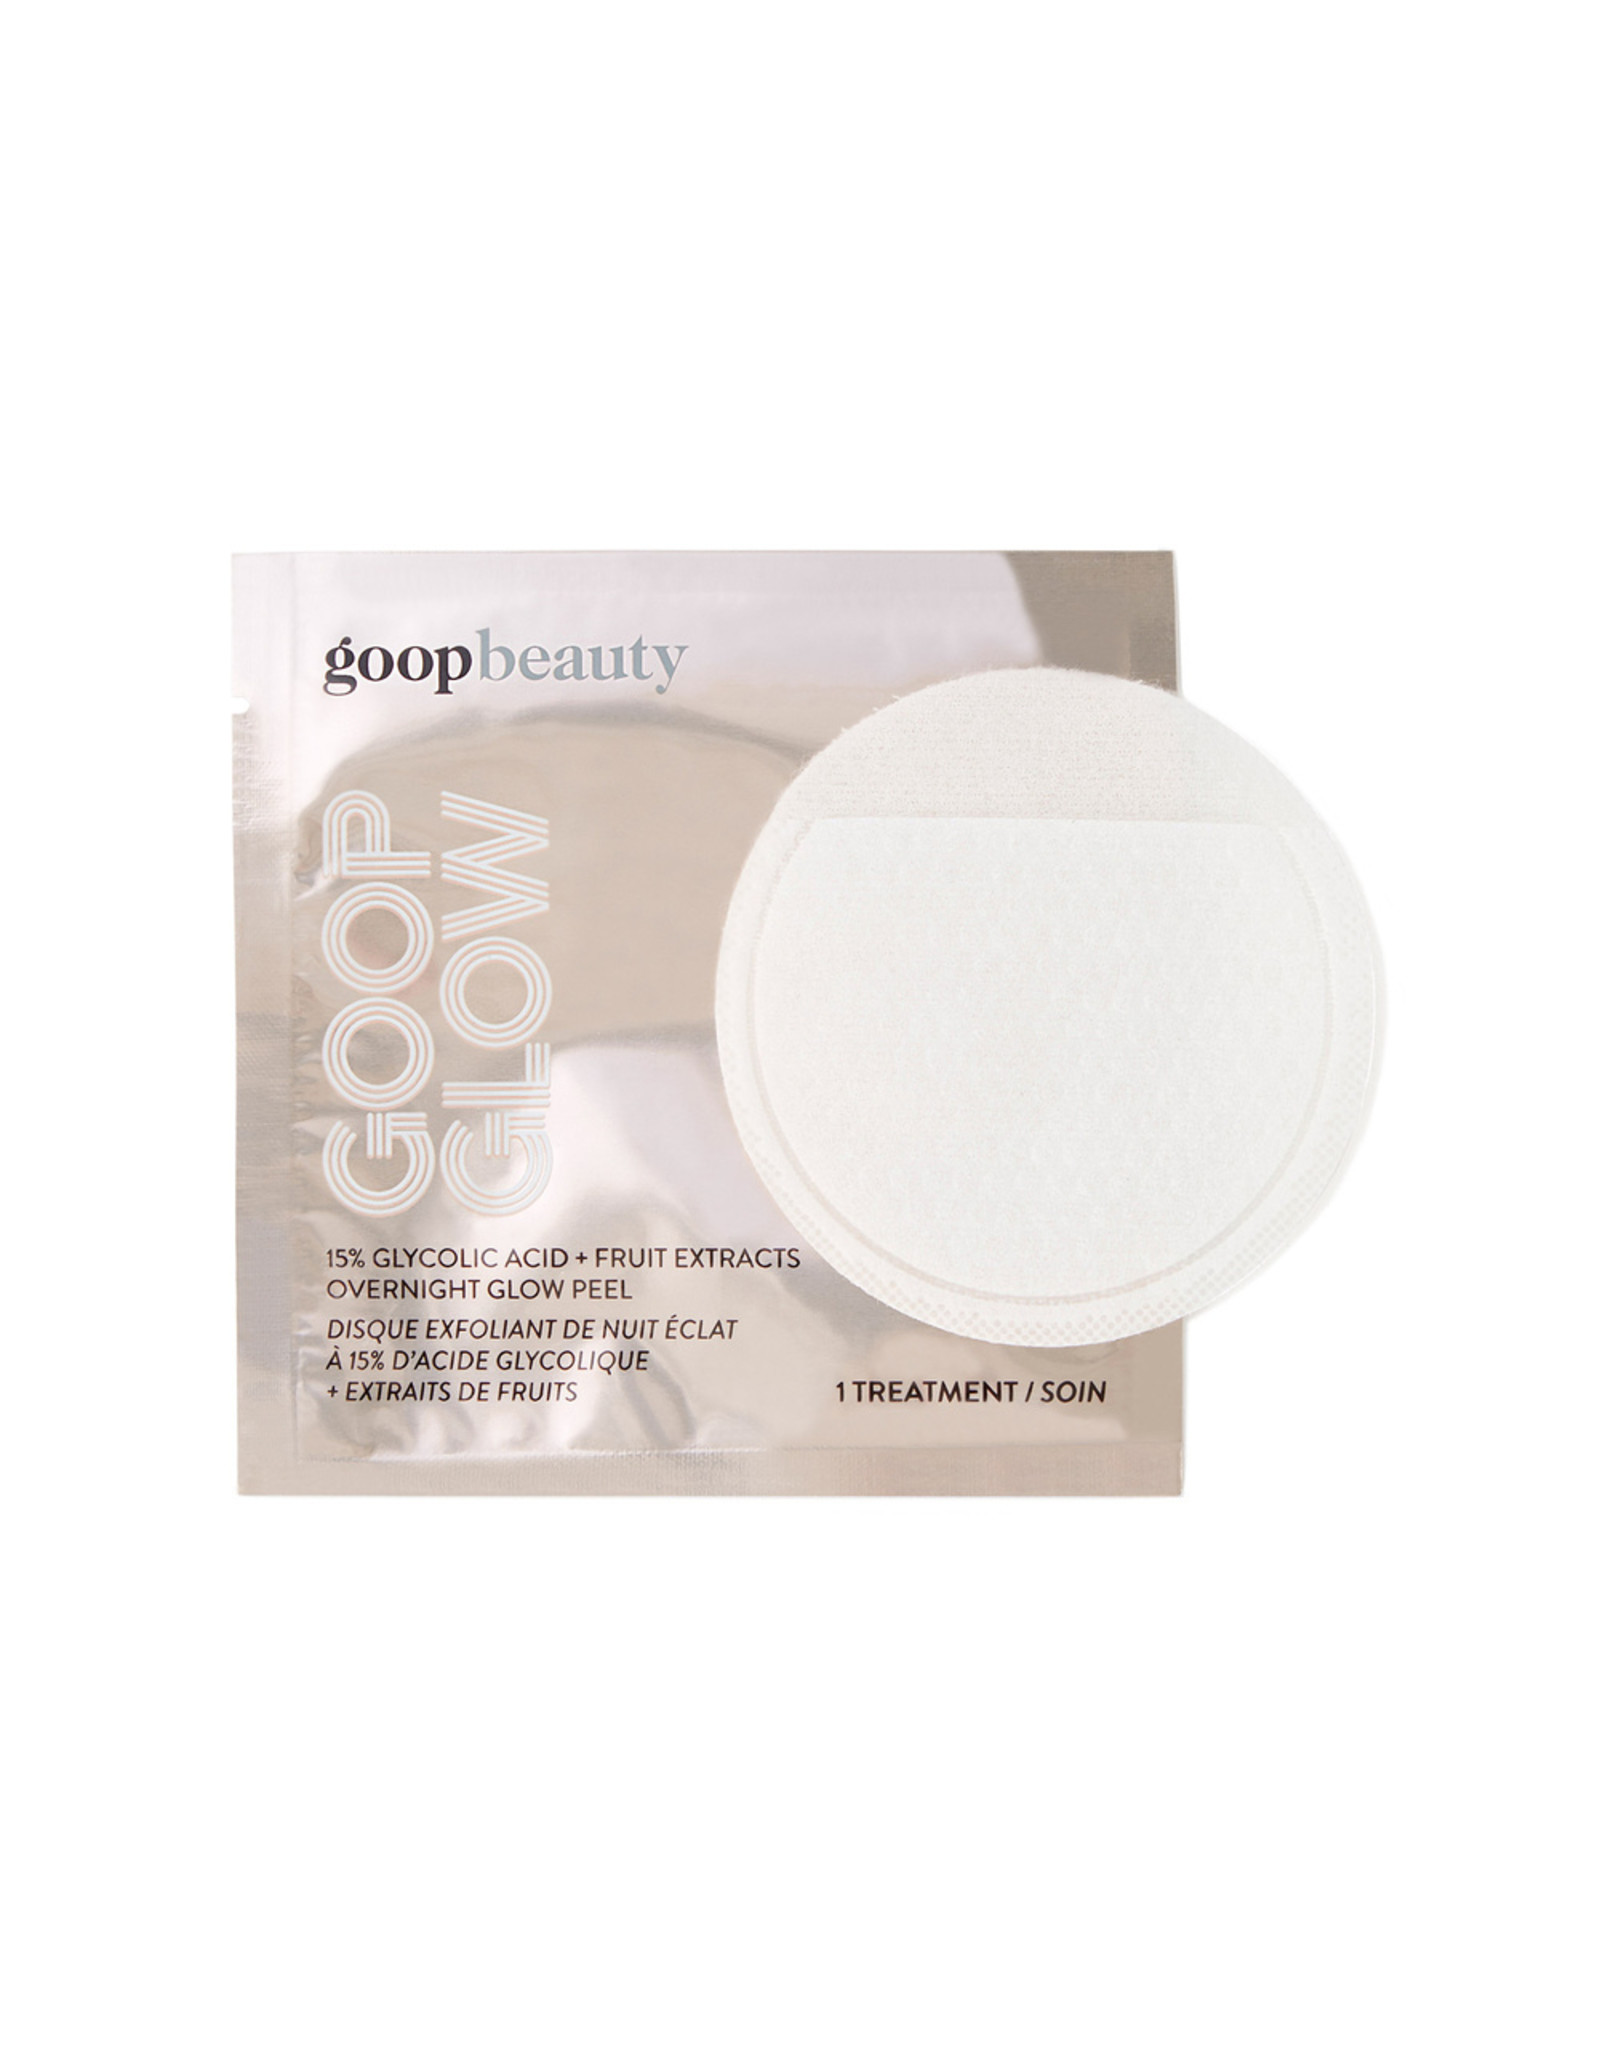 Goop goop Beauty GOOPGLOW 15% Glycolic Overnight Glow Peel (Size: 12-Pack)